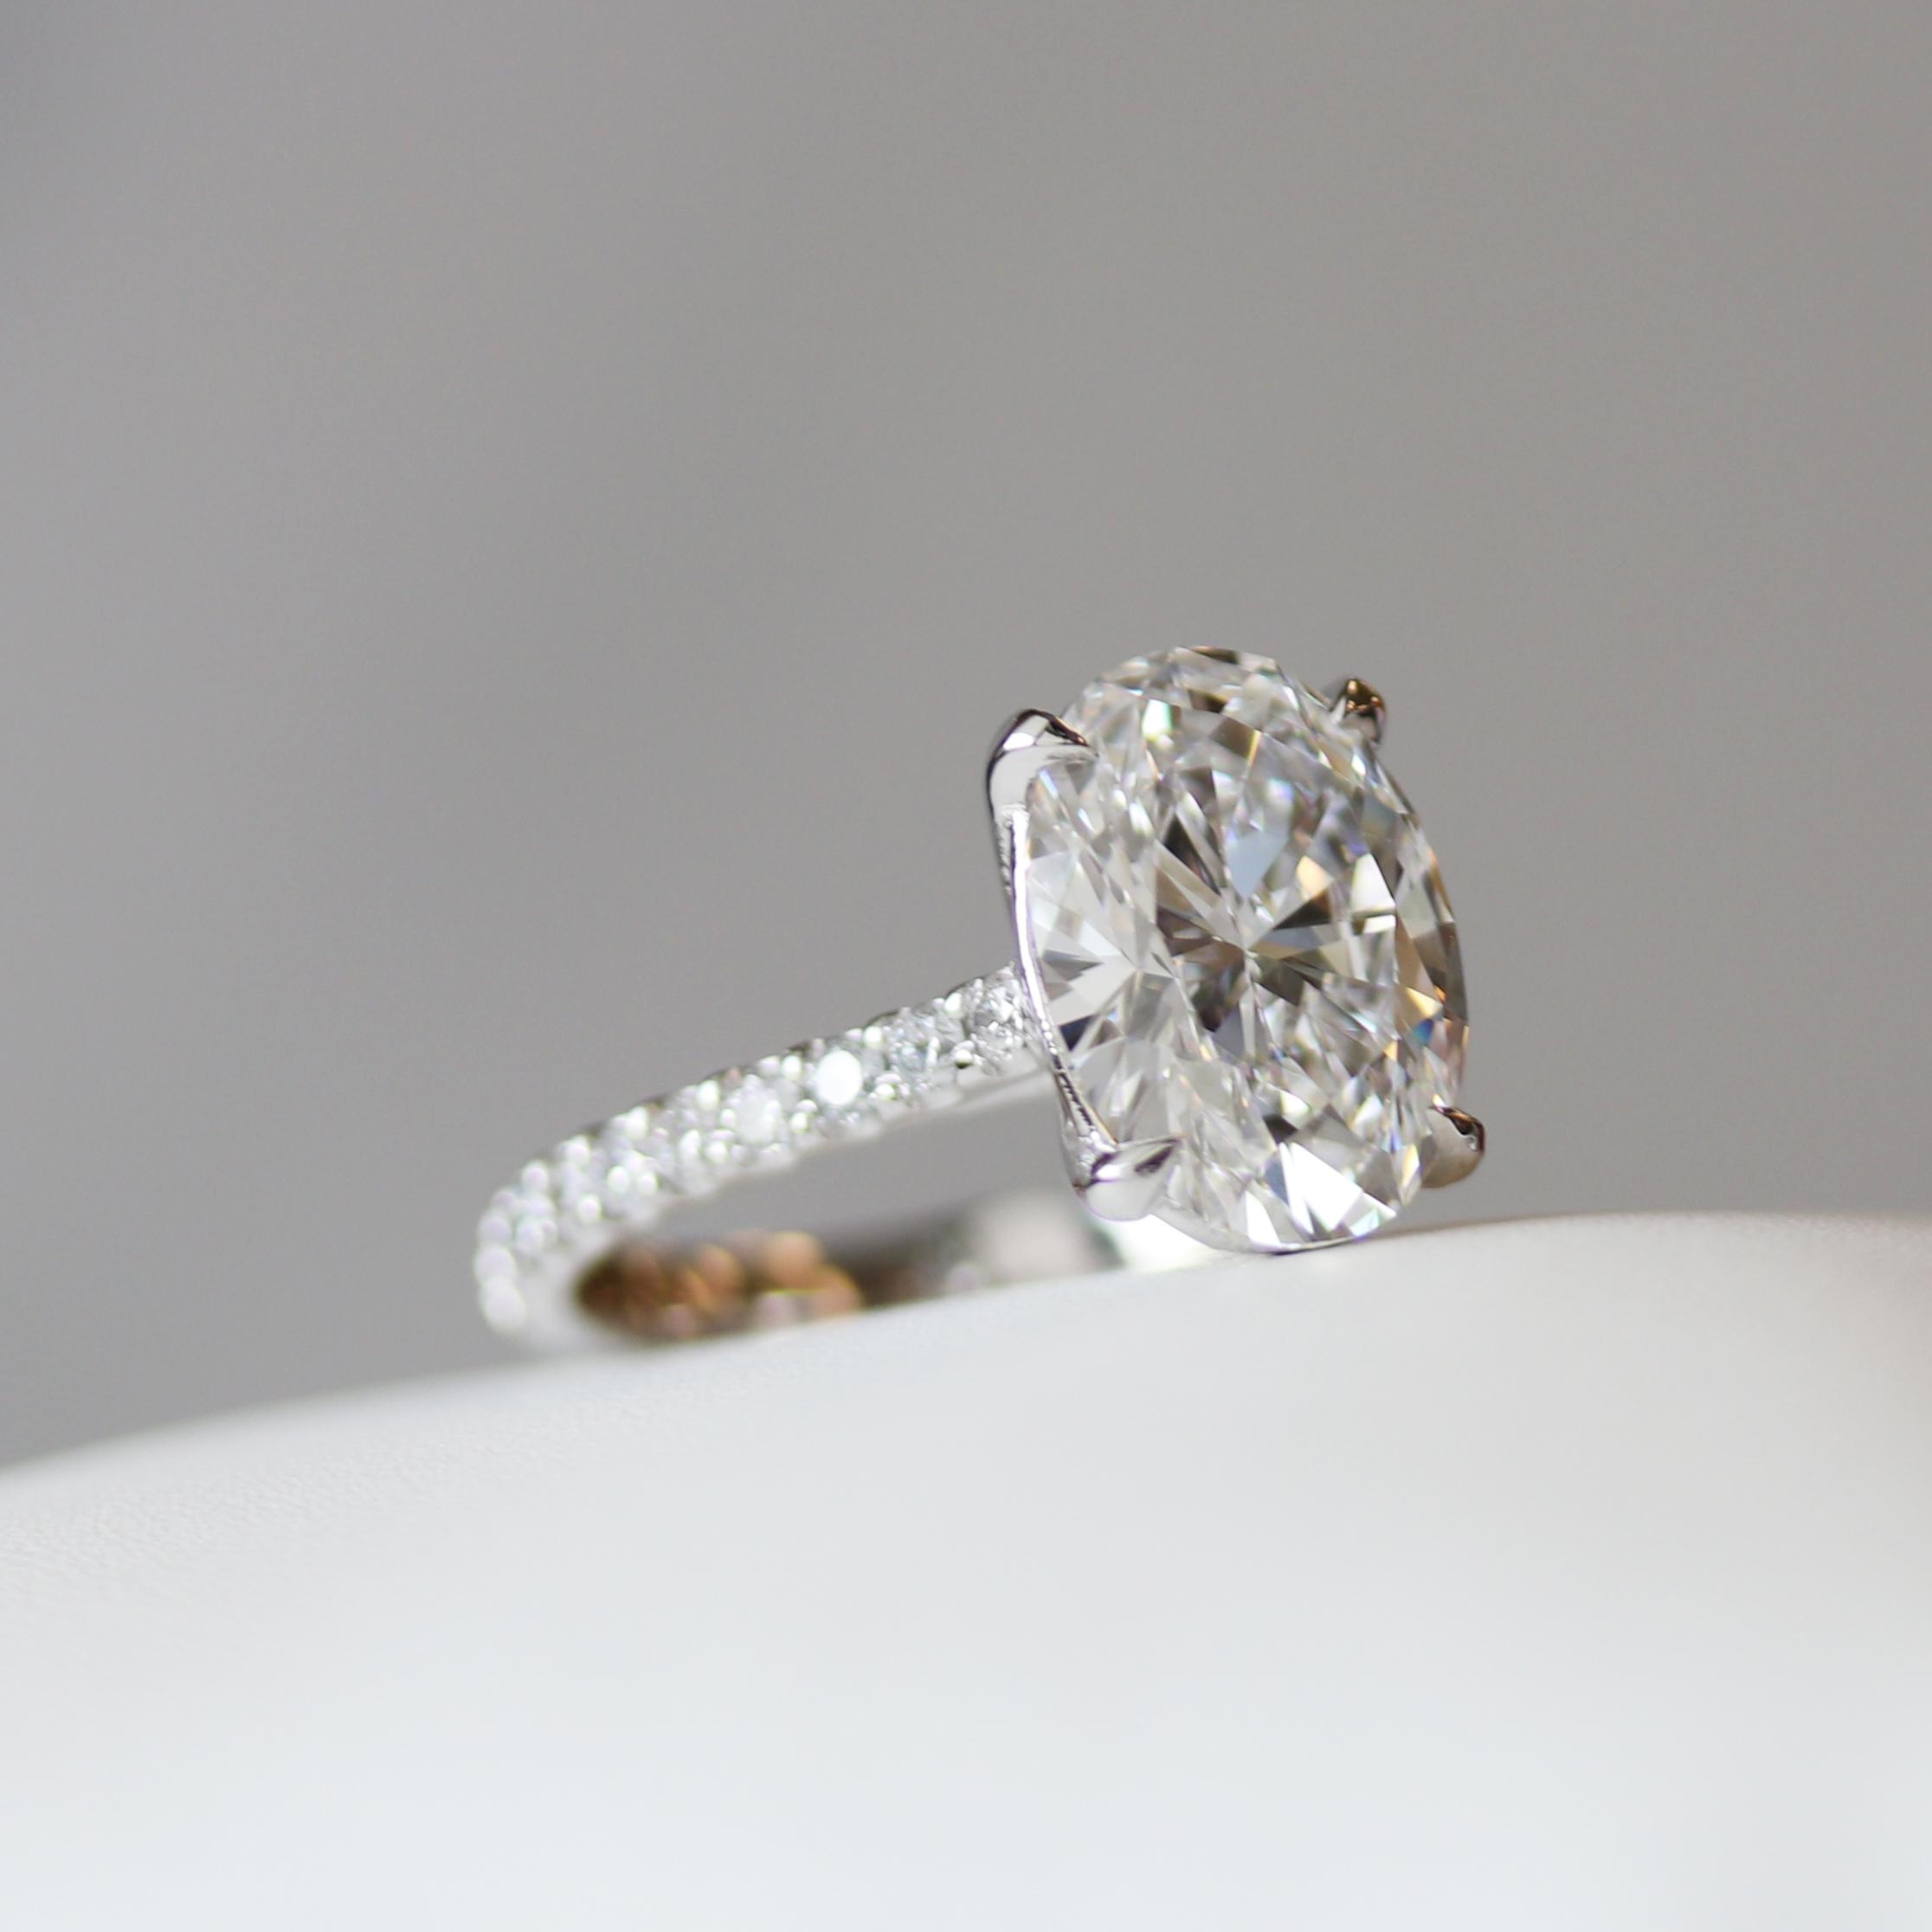 3 carat lab grown oval diamond engagement ring by Ada Diamonds